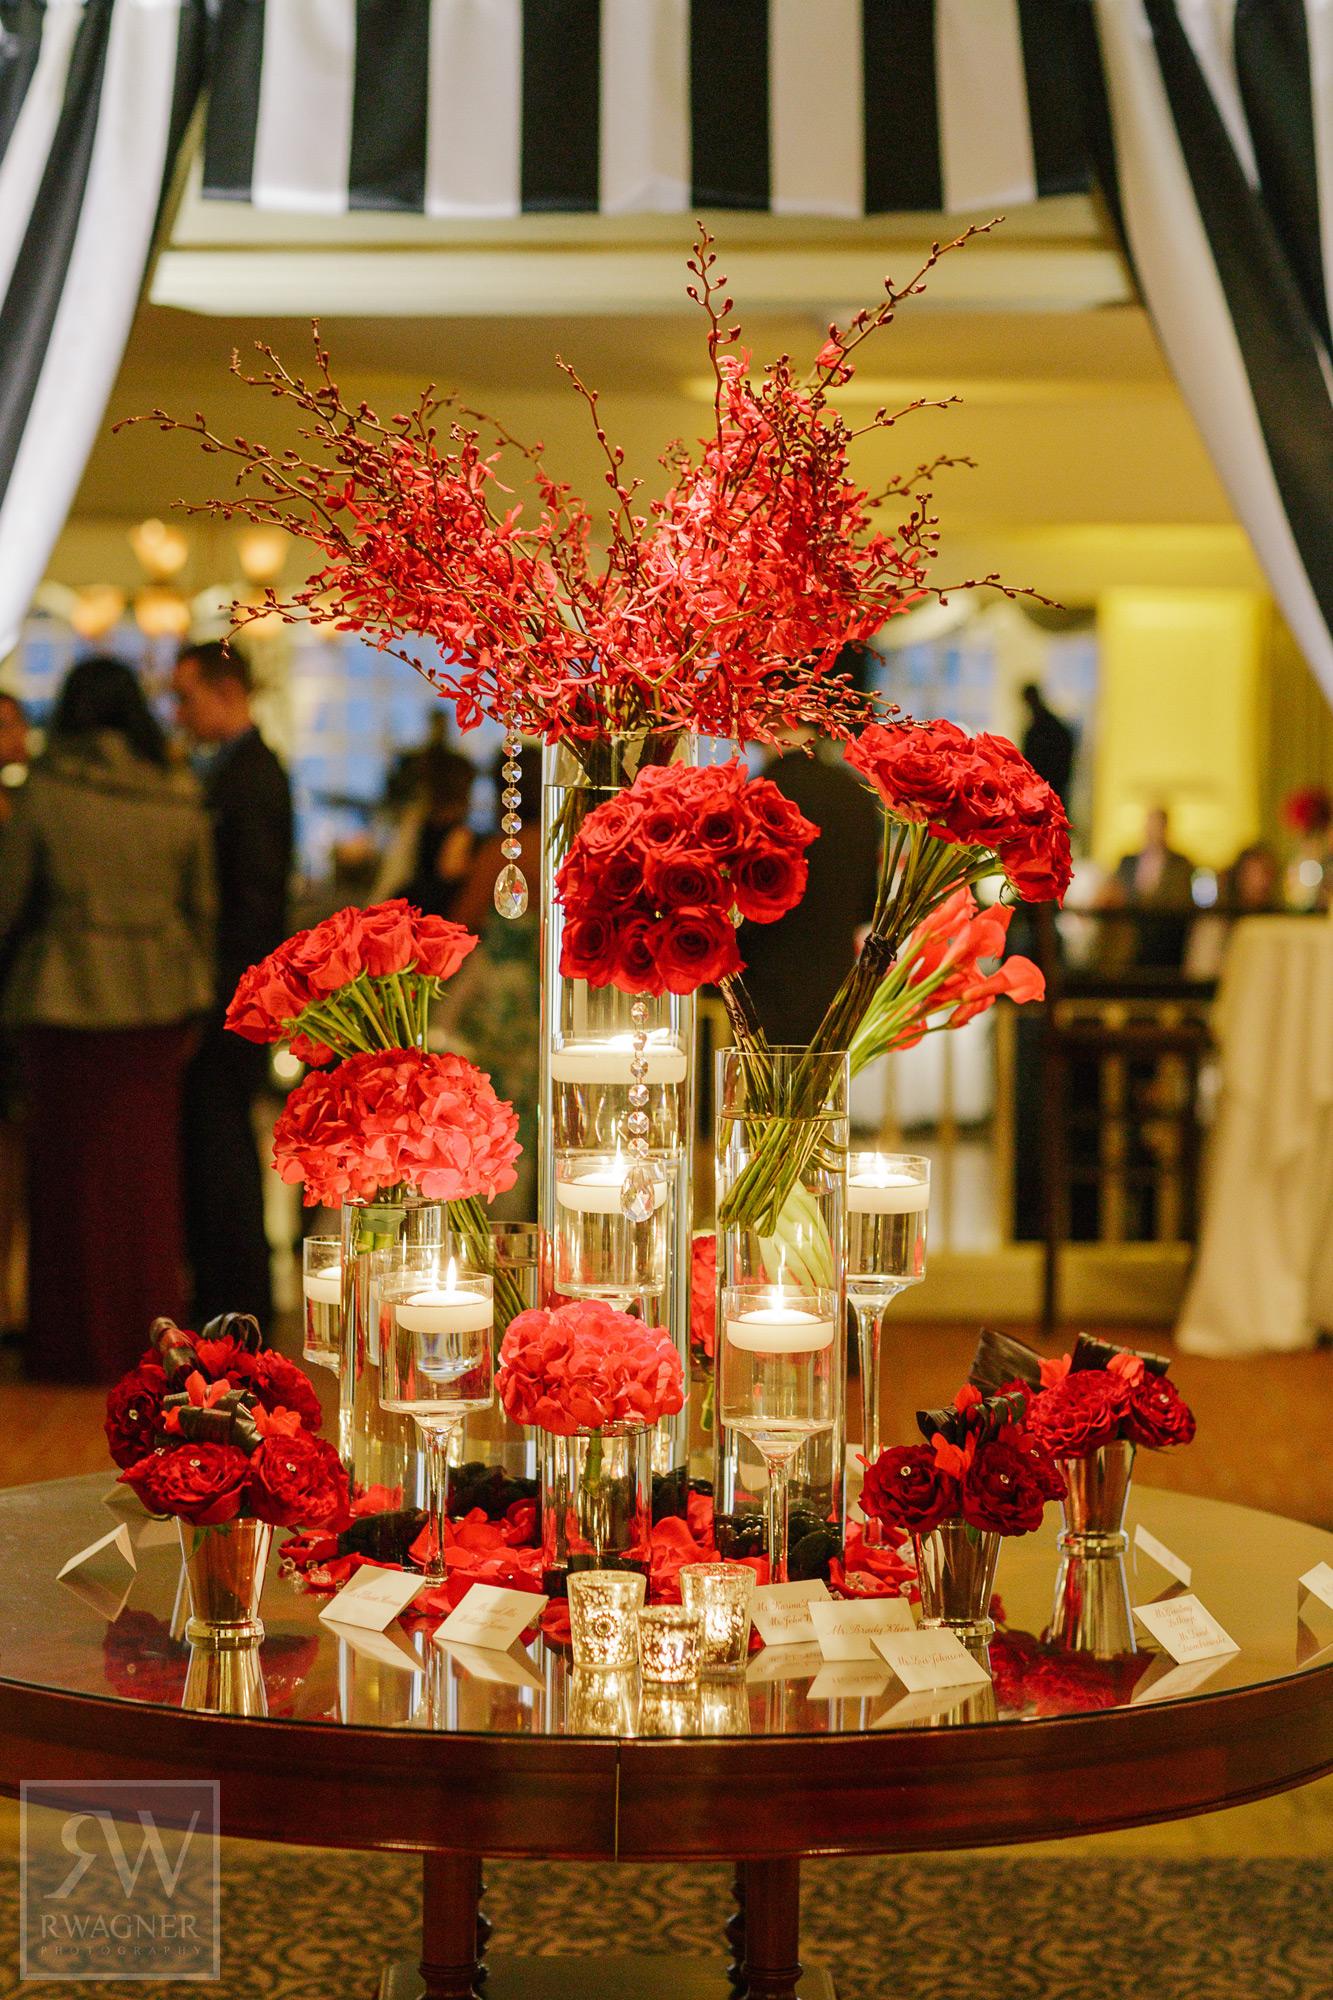 ceci_new_york_luxury_wedding_invitations_couture_red_black_white_real_wedding_dramatic_inn_at_longshore_v286_27.jpg